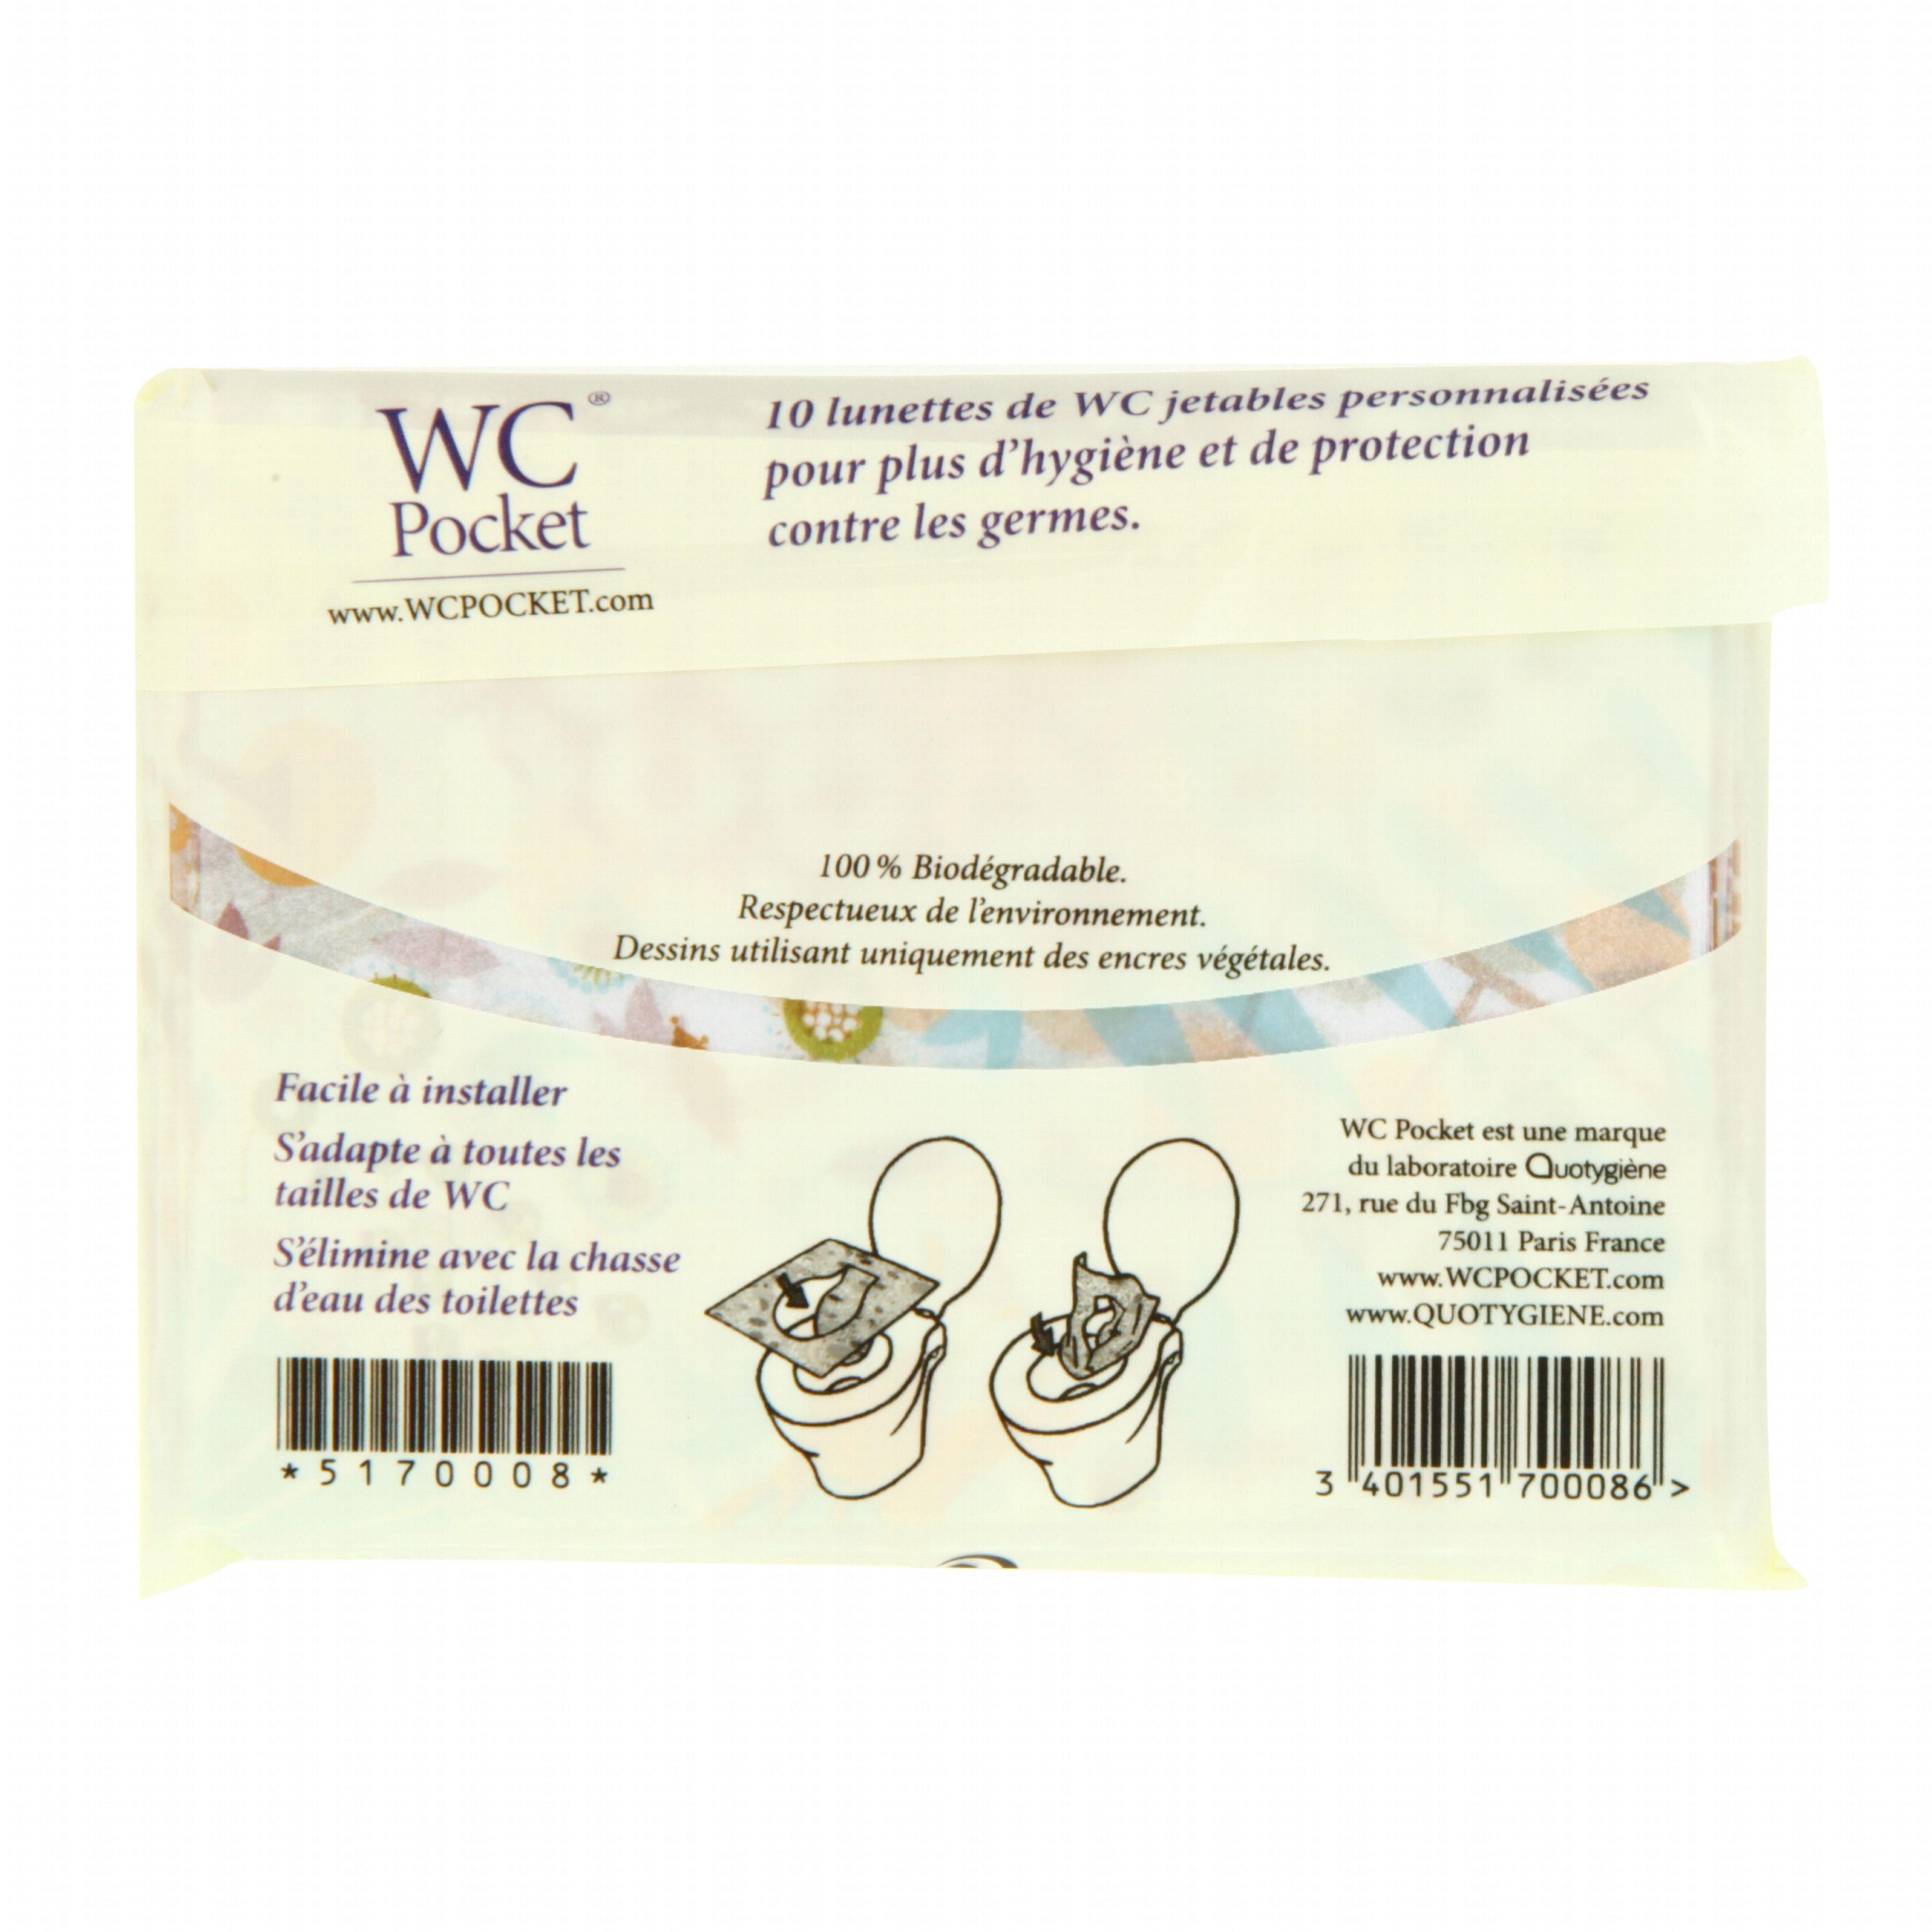 Ides pharma wc pocket lunettes de wc jetables x 10 pharmacie en ligne prado - Lunette wc chauffante ...